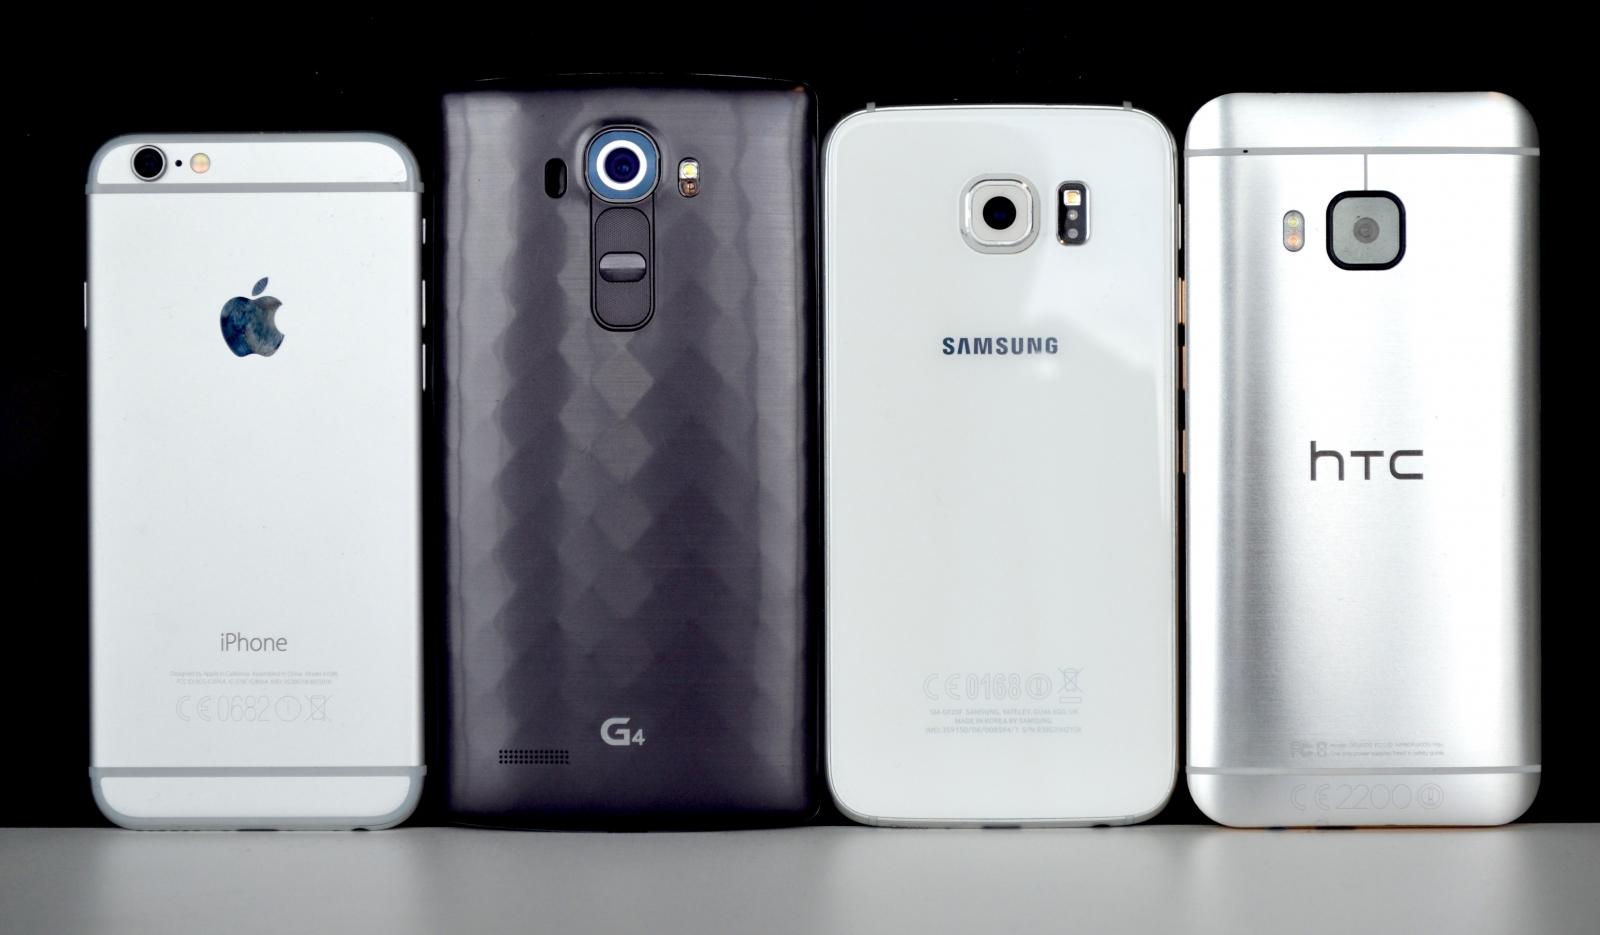 iPhone 6 G4 Galaxy S6 One M9